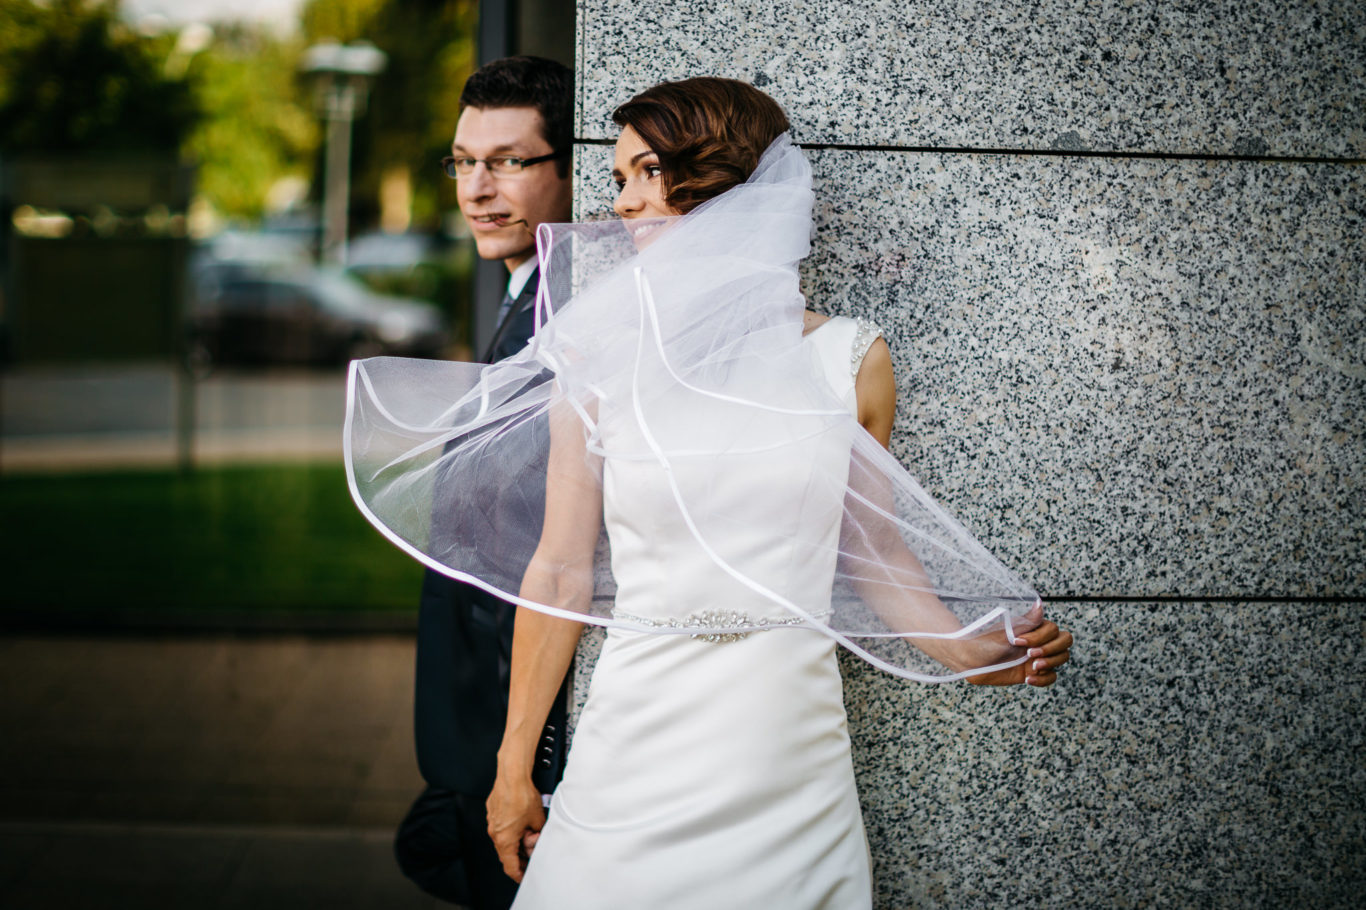 0338-fotografie-nunta-bucuresti-dana-radu-fotograf-ciprian-dumitrescu-cd2_7085